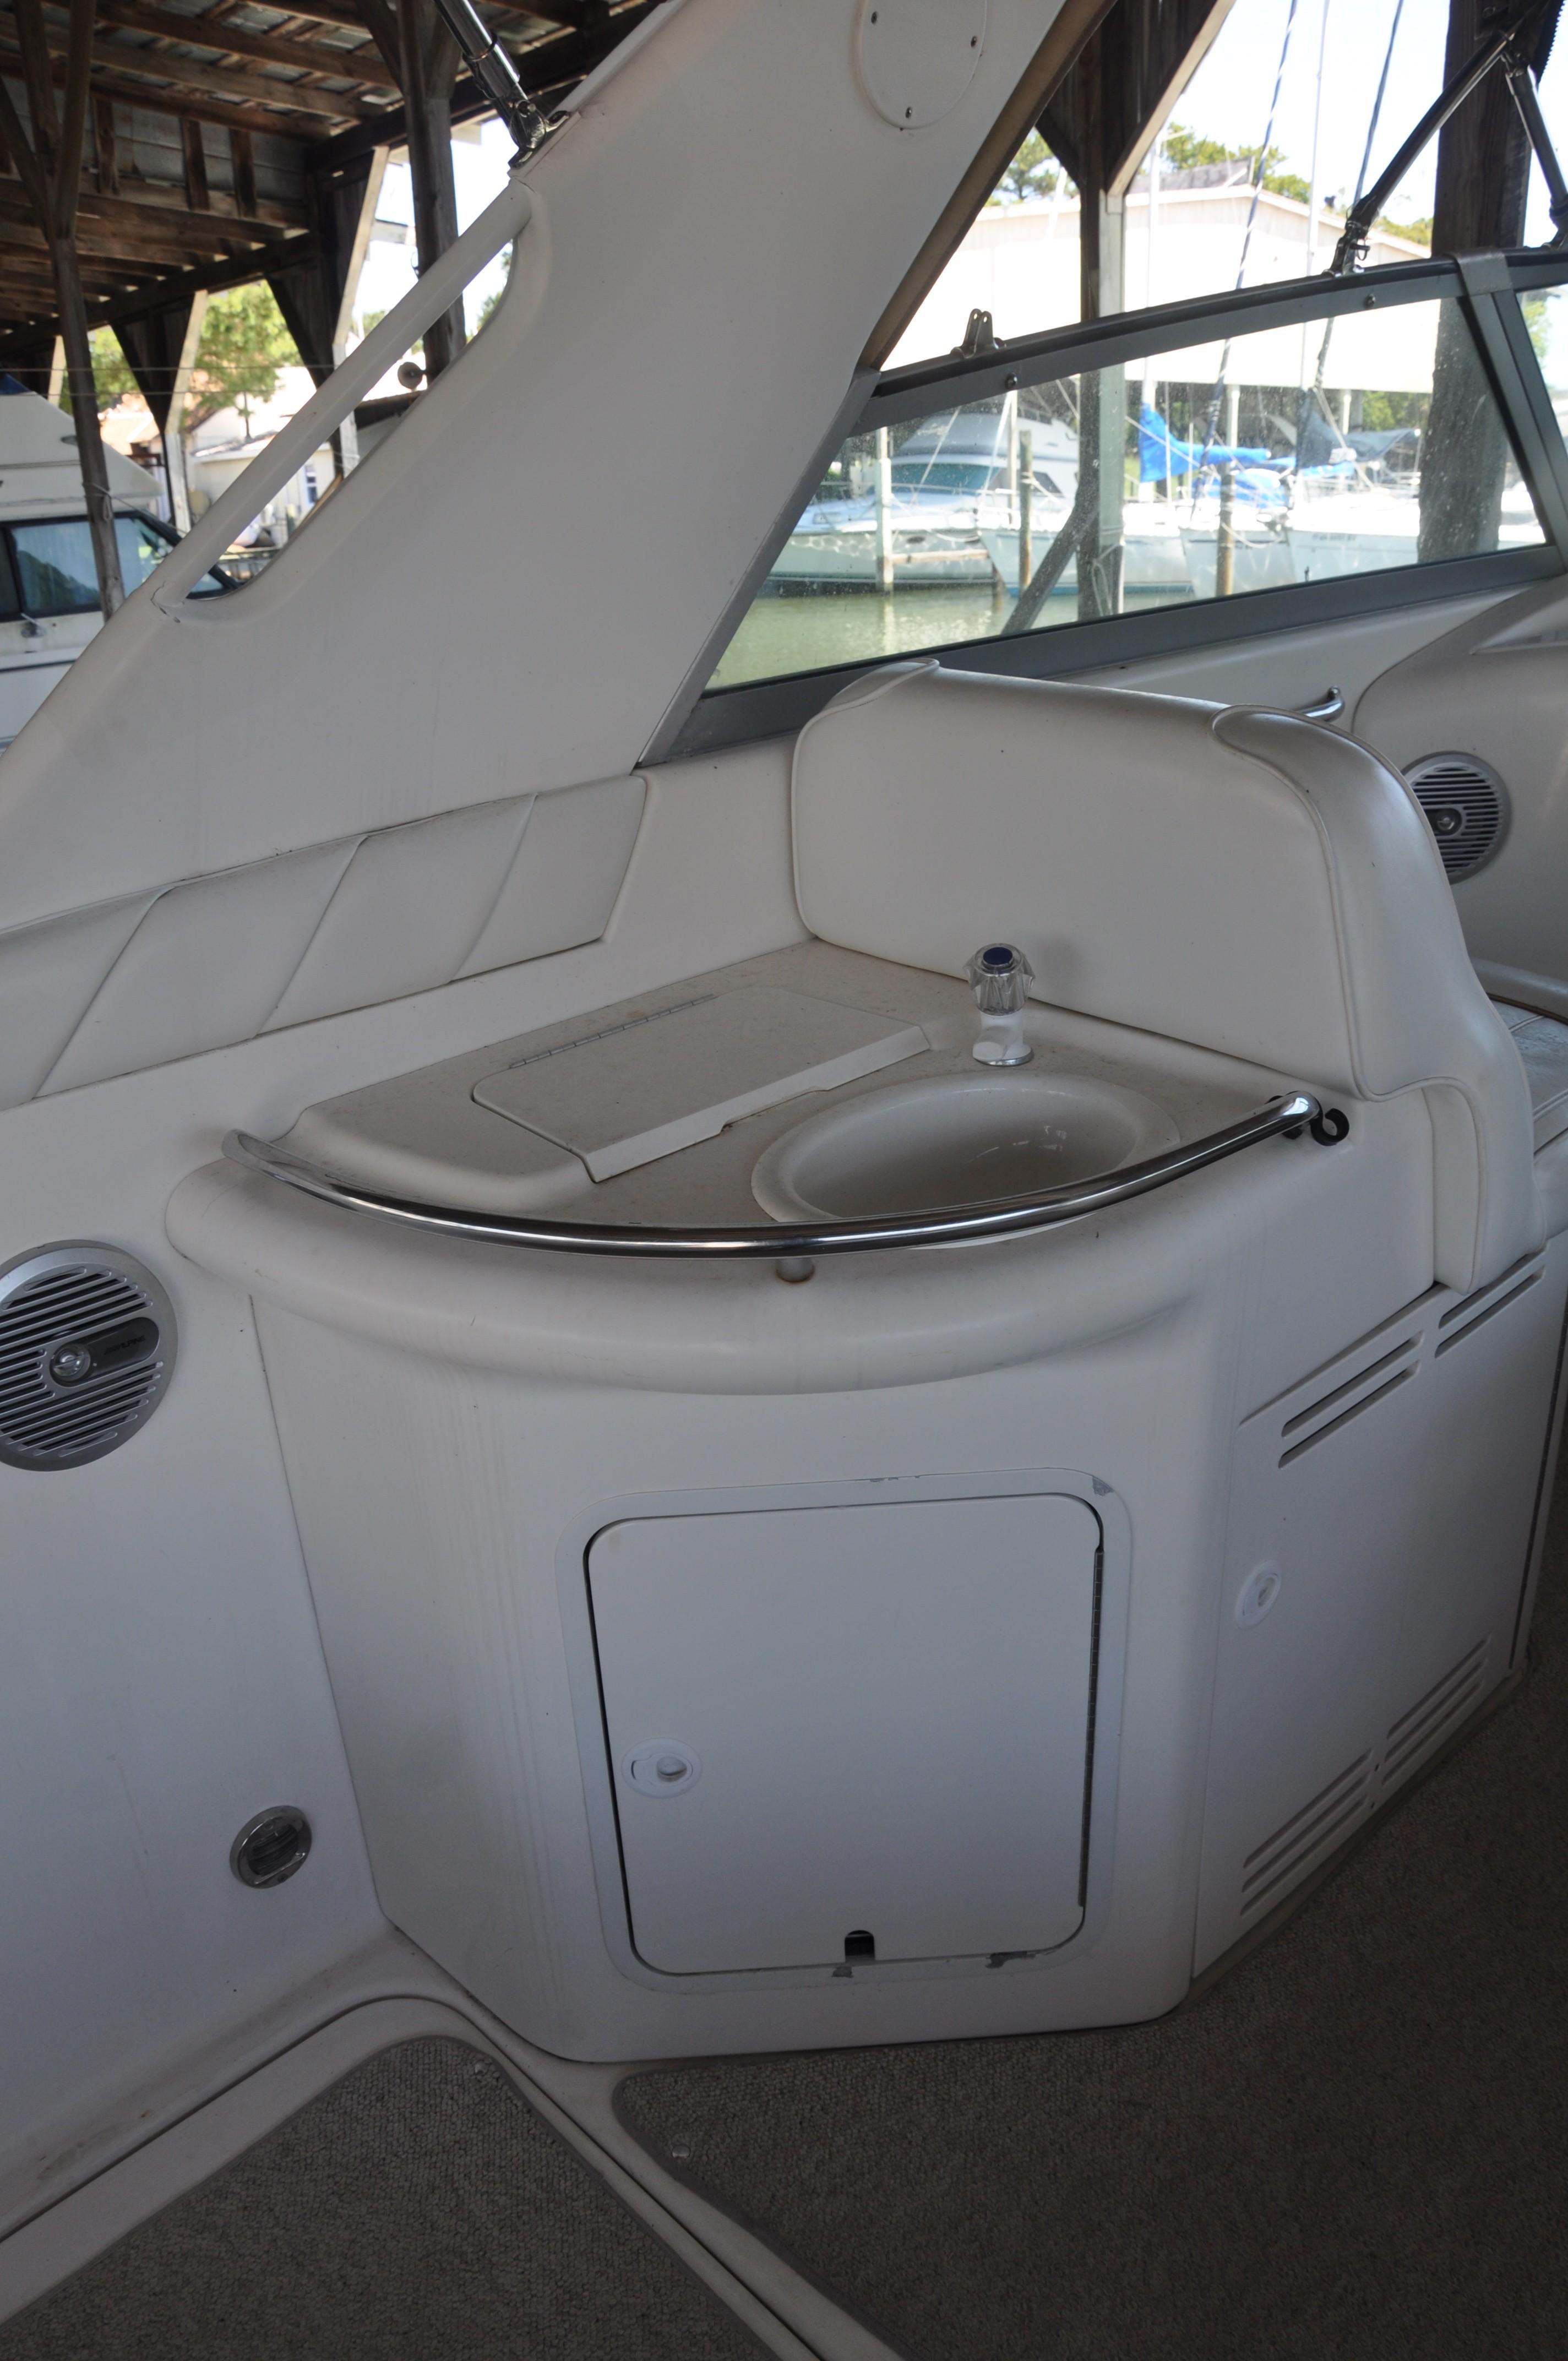 1996 Sea Ray 330 Sundancer | Powerboats for Sale